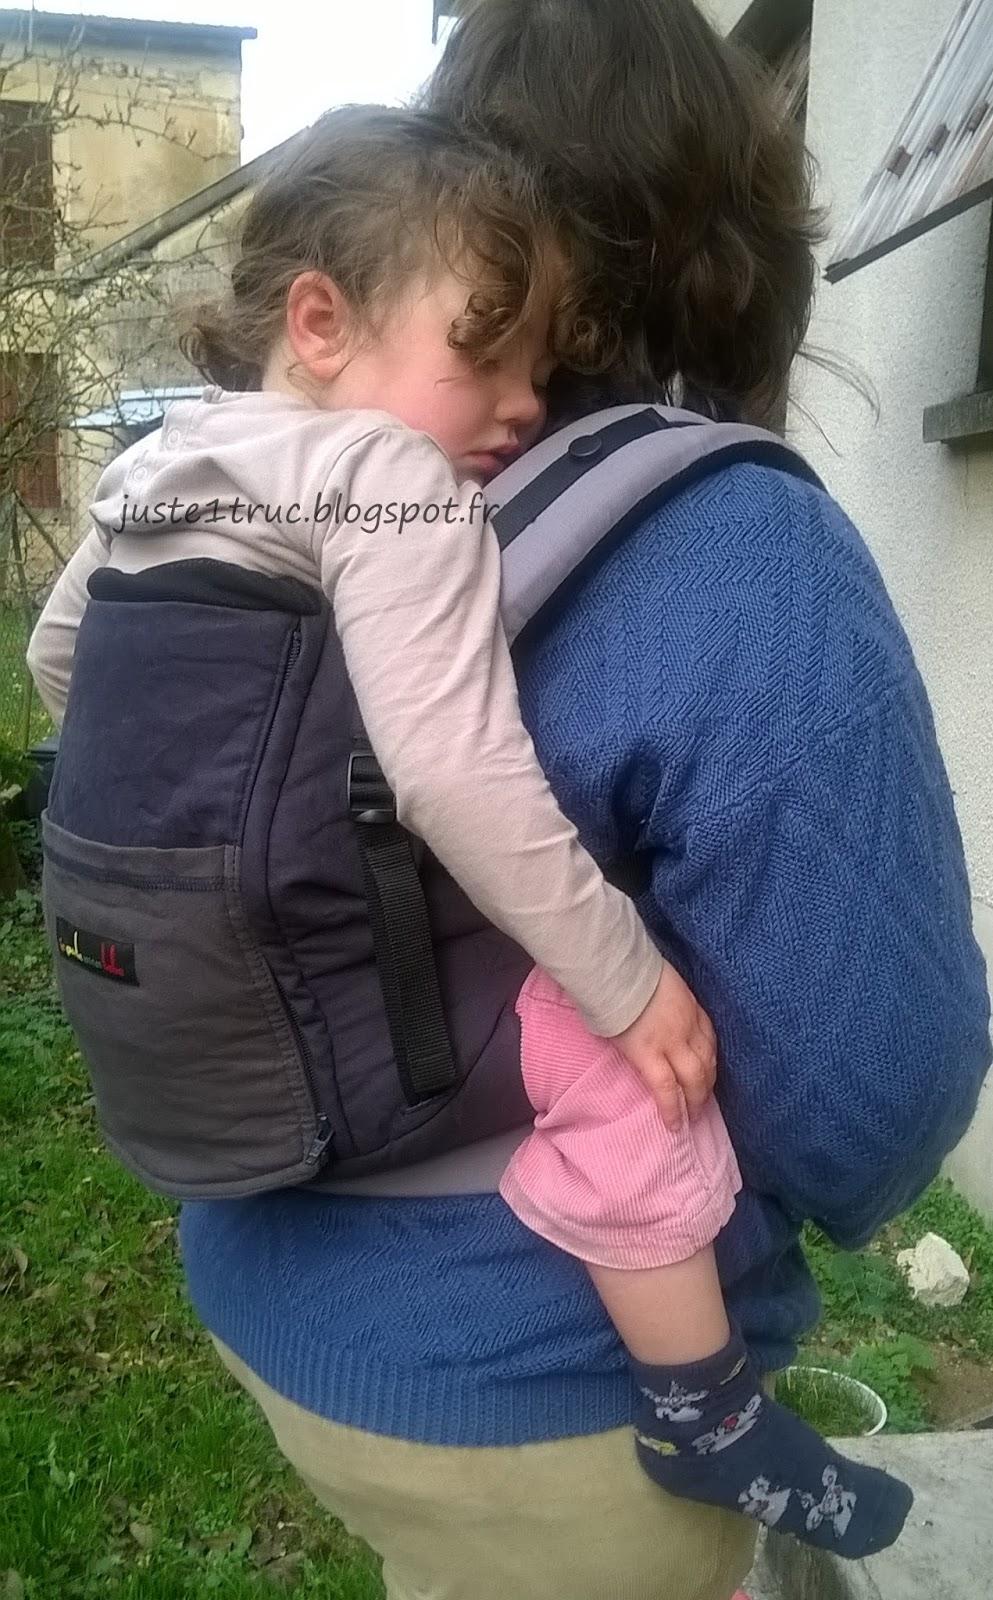 JPMBB Physio physiocarrier préformé porte-bébé portage babywearing  fullbuckle bambin porter booster naissance 01c1c5f40be